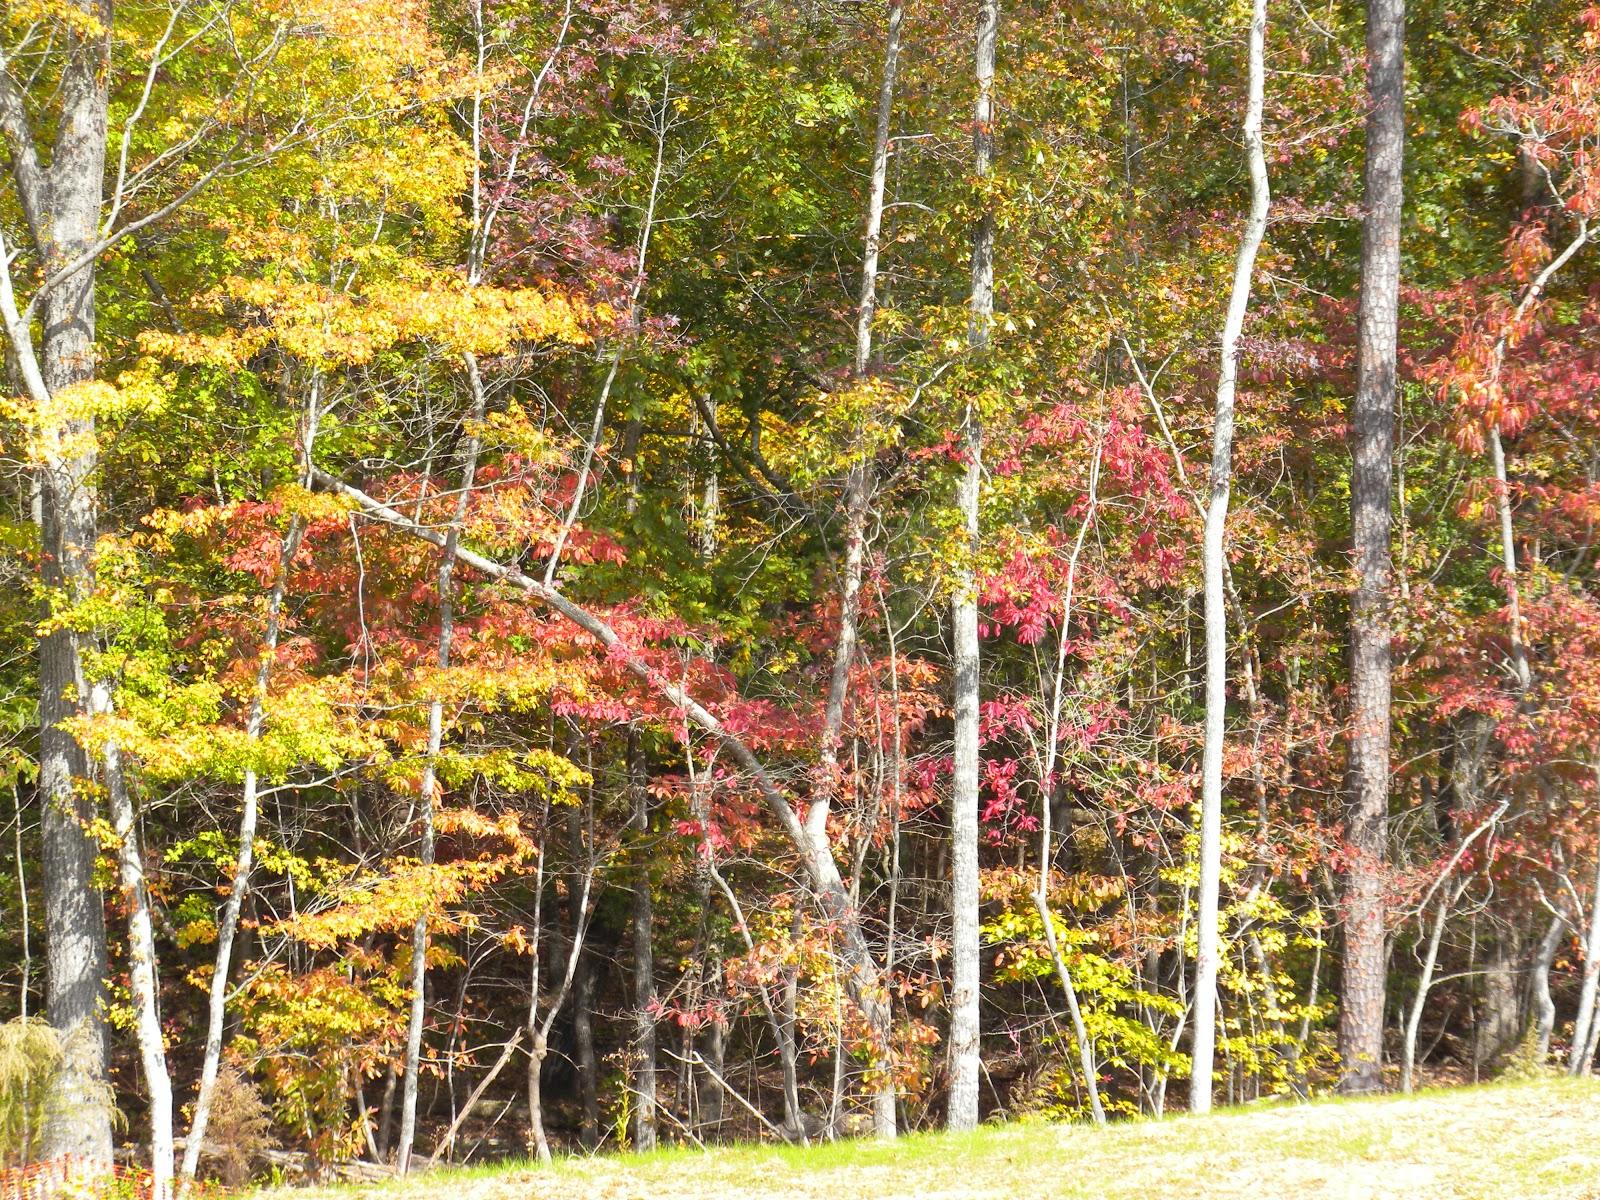 Fall in the Carolinas